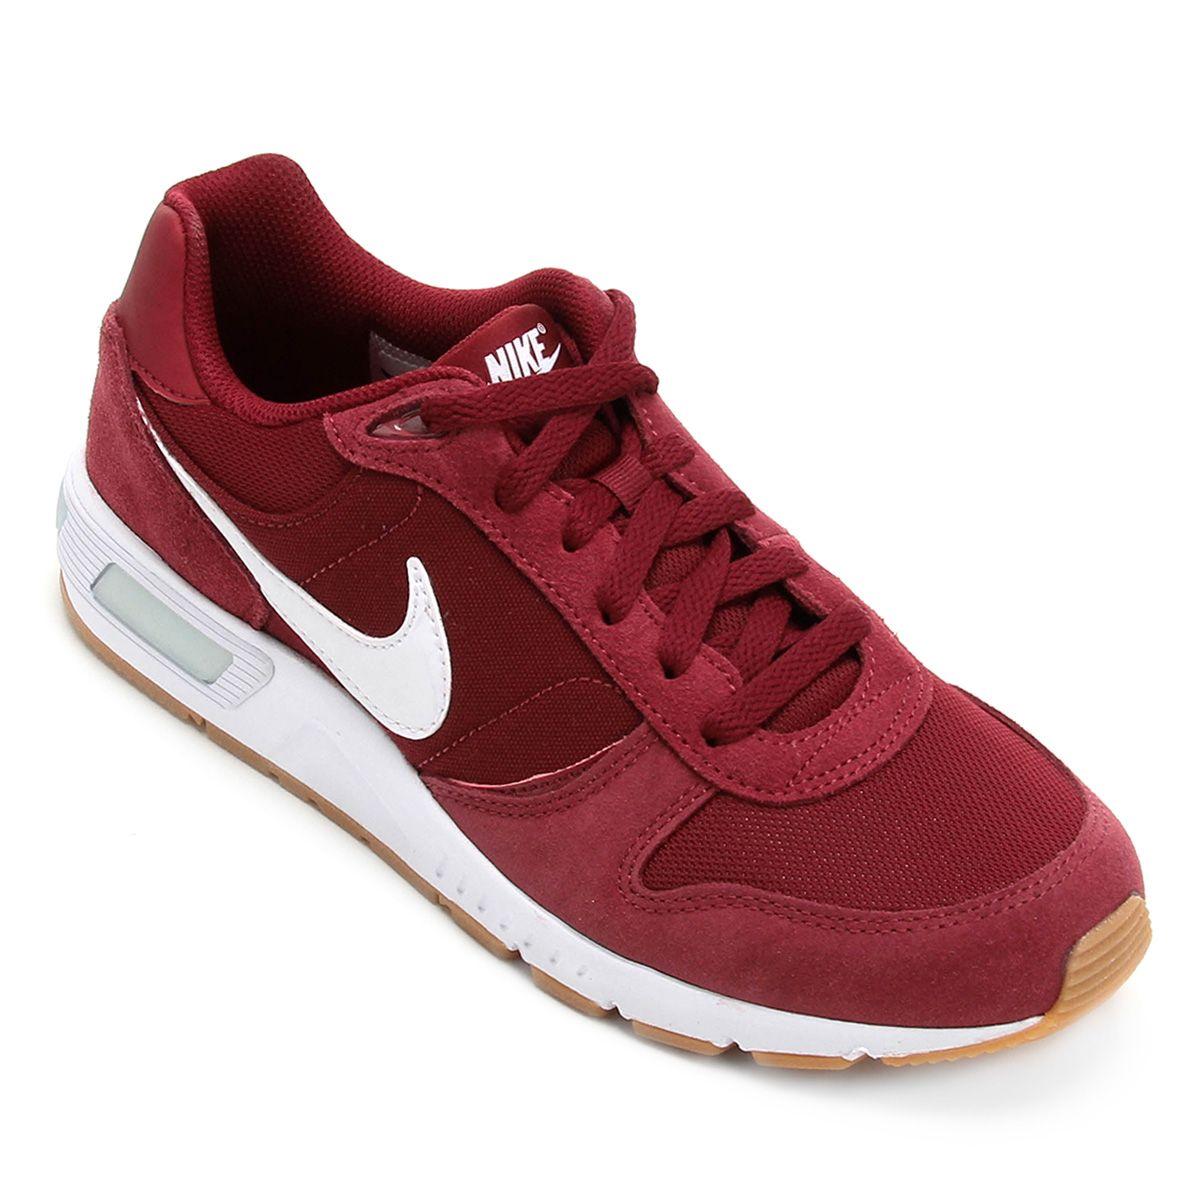 Tenis Nike Nightgazer Masculino Vermelho E Branco Tenis Nike